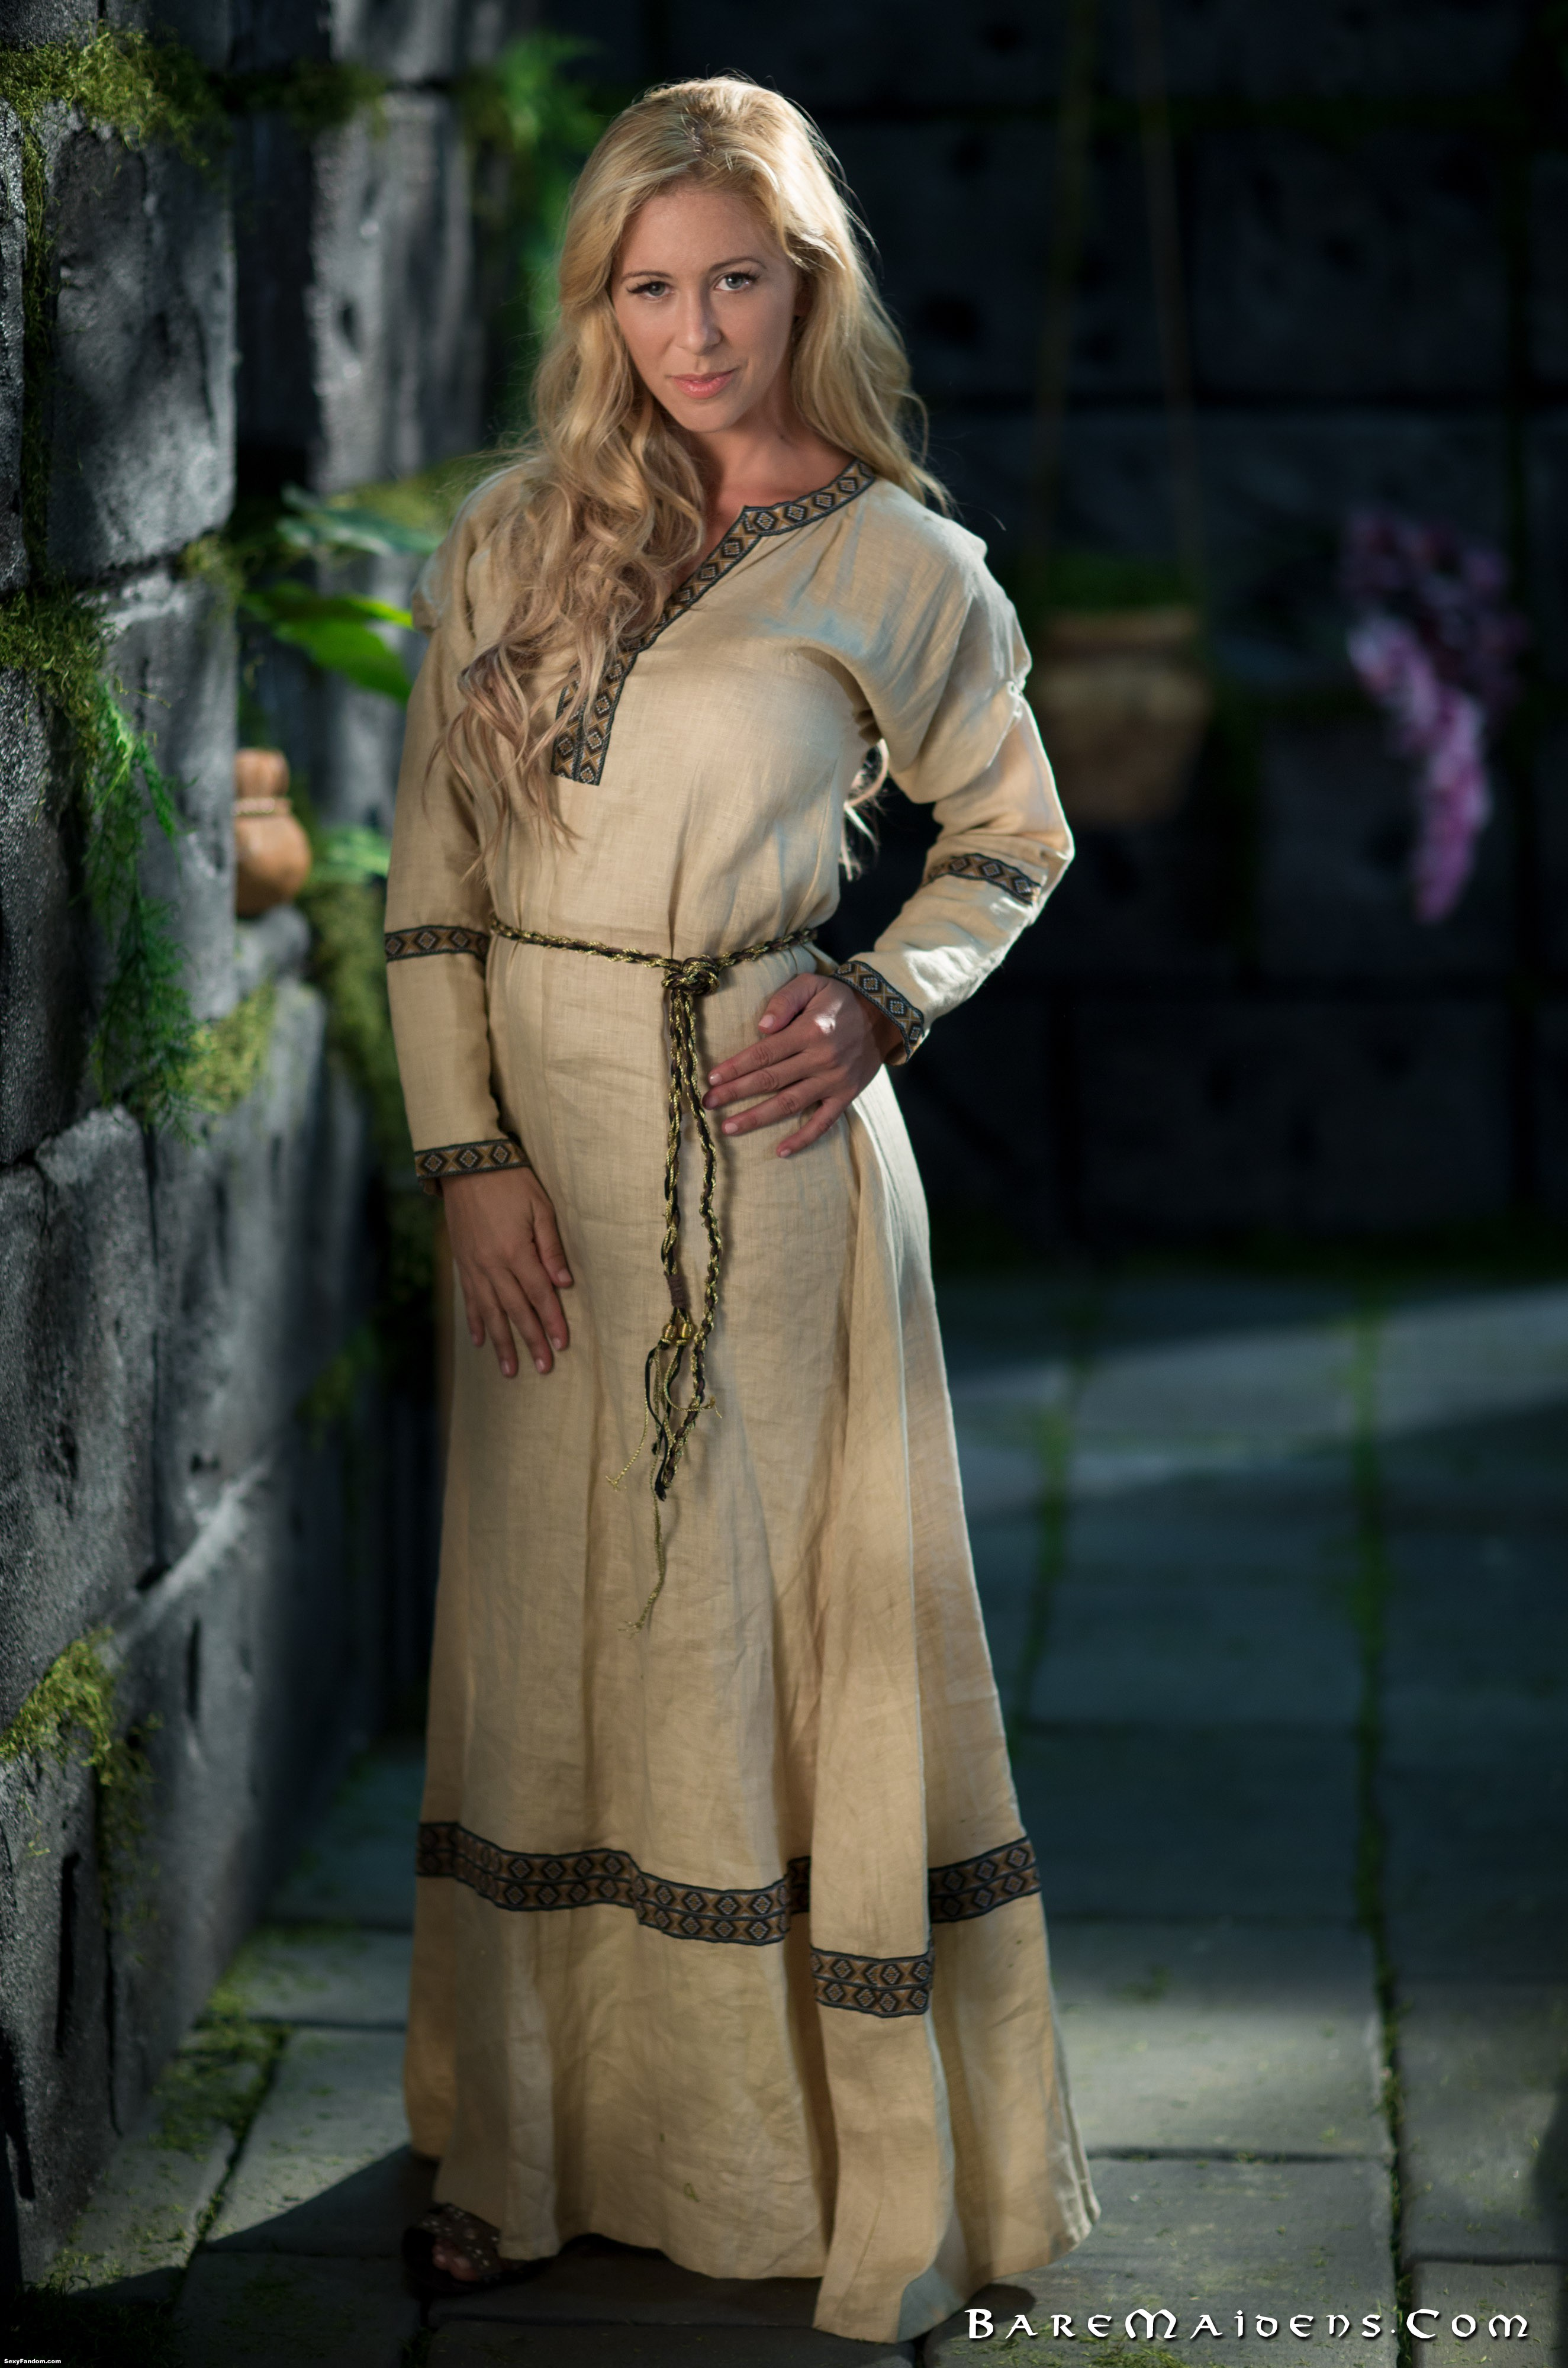 Cherie Deville Is The Fair Lady Of Your Dreams